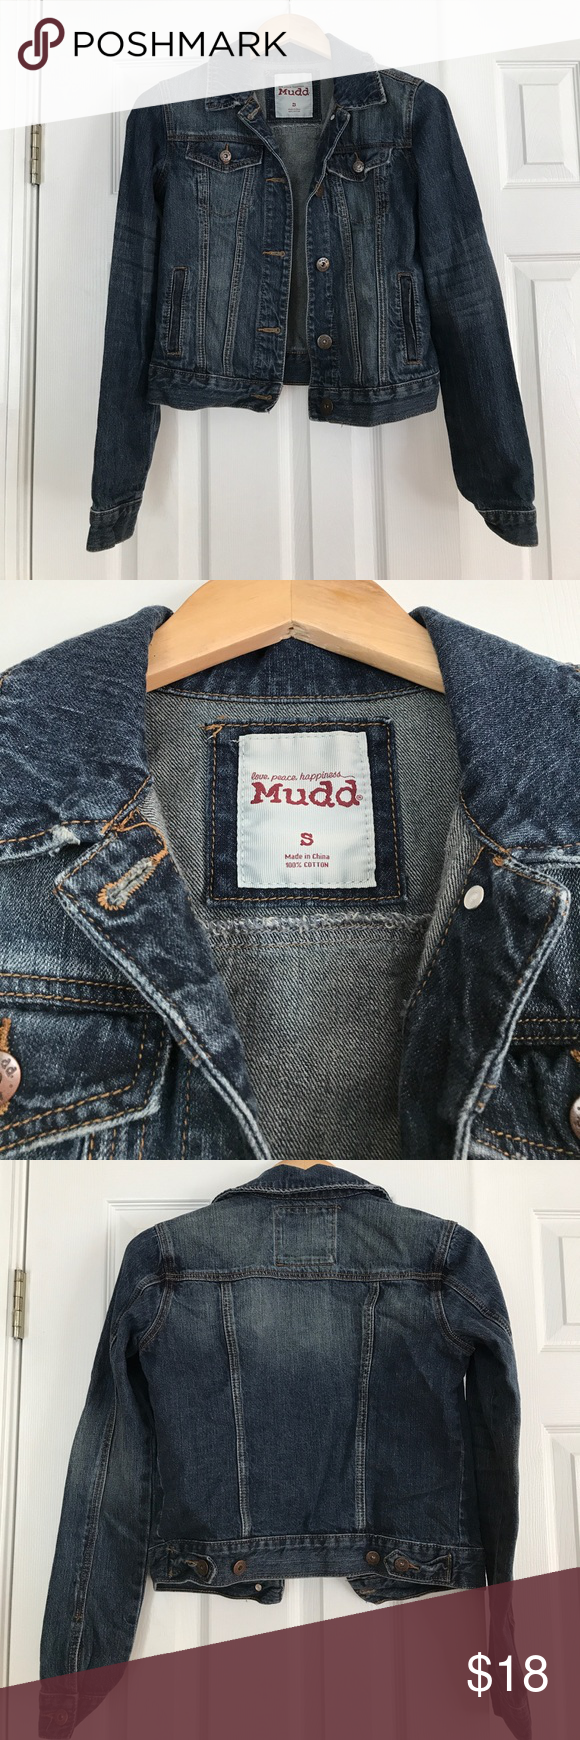 Mudd Denim Jacket Great condition denim jacket. Size small. Mudd Jackets & Coats